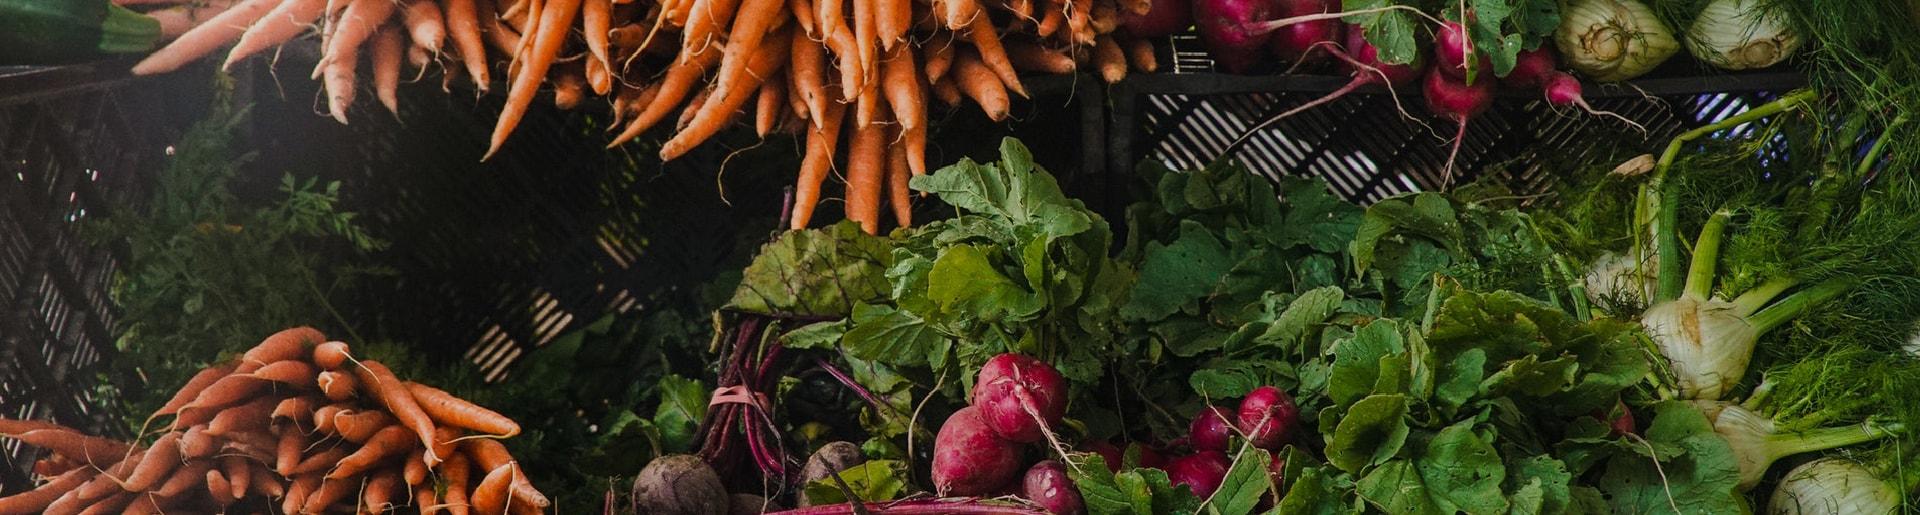 veggies at a farmers market